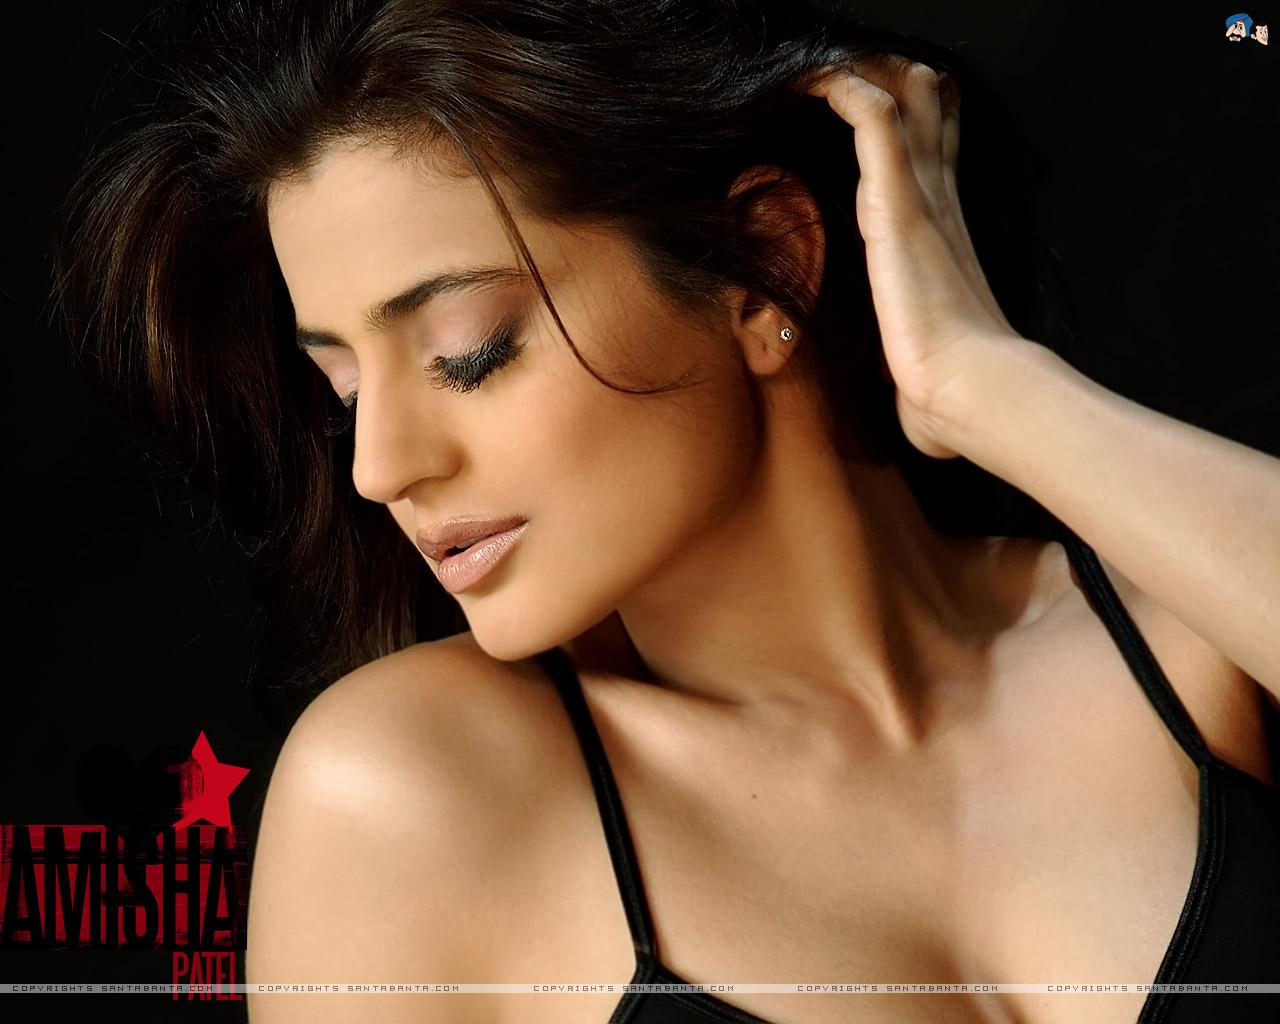 picture amisha patel indian celebrities